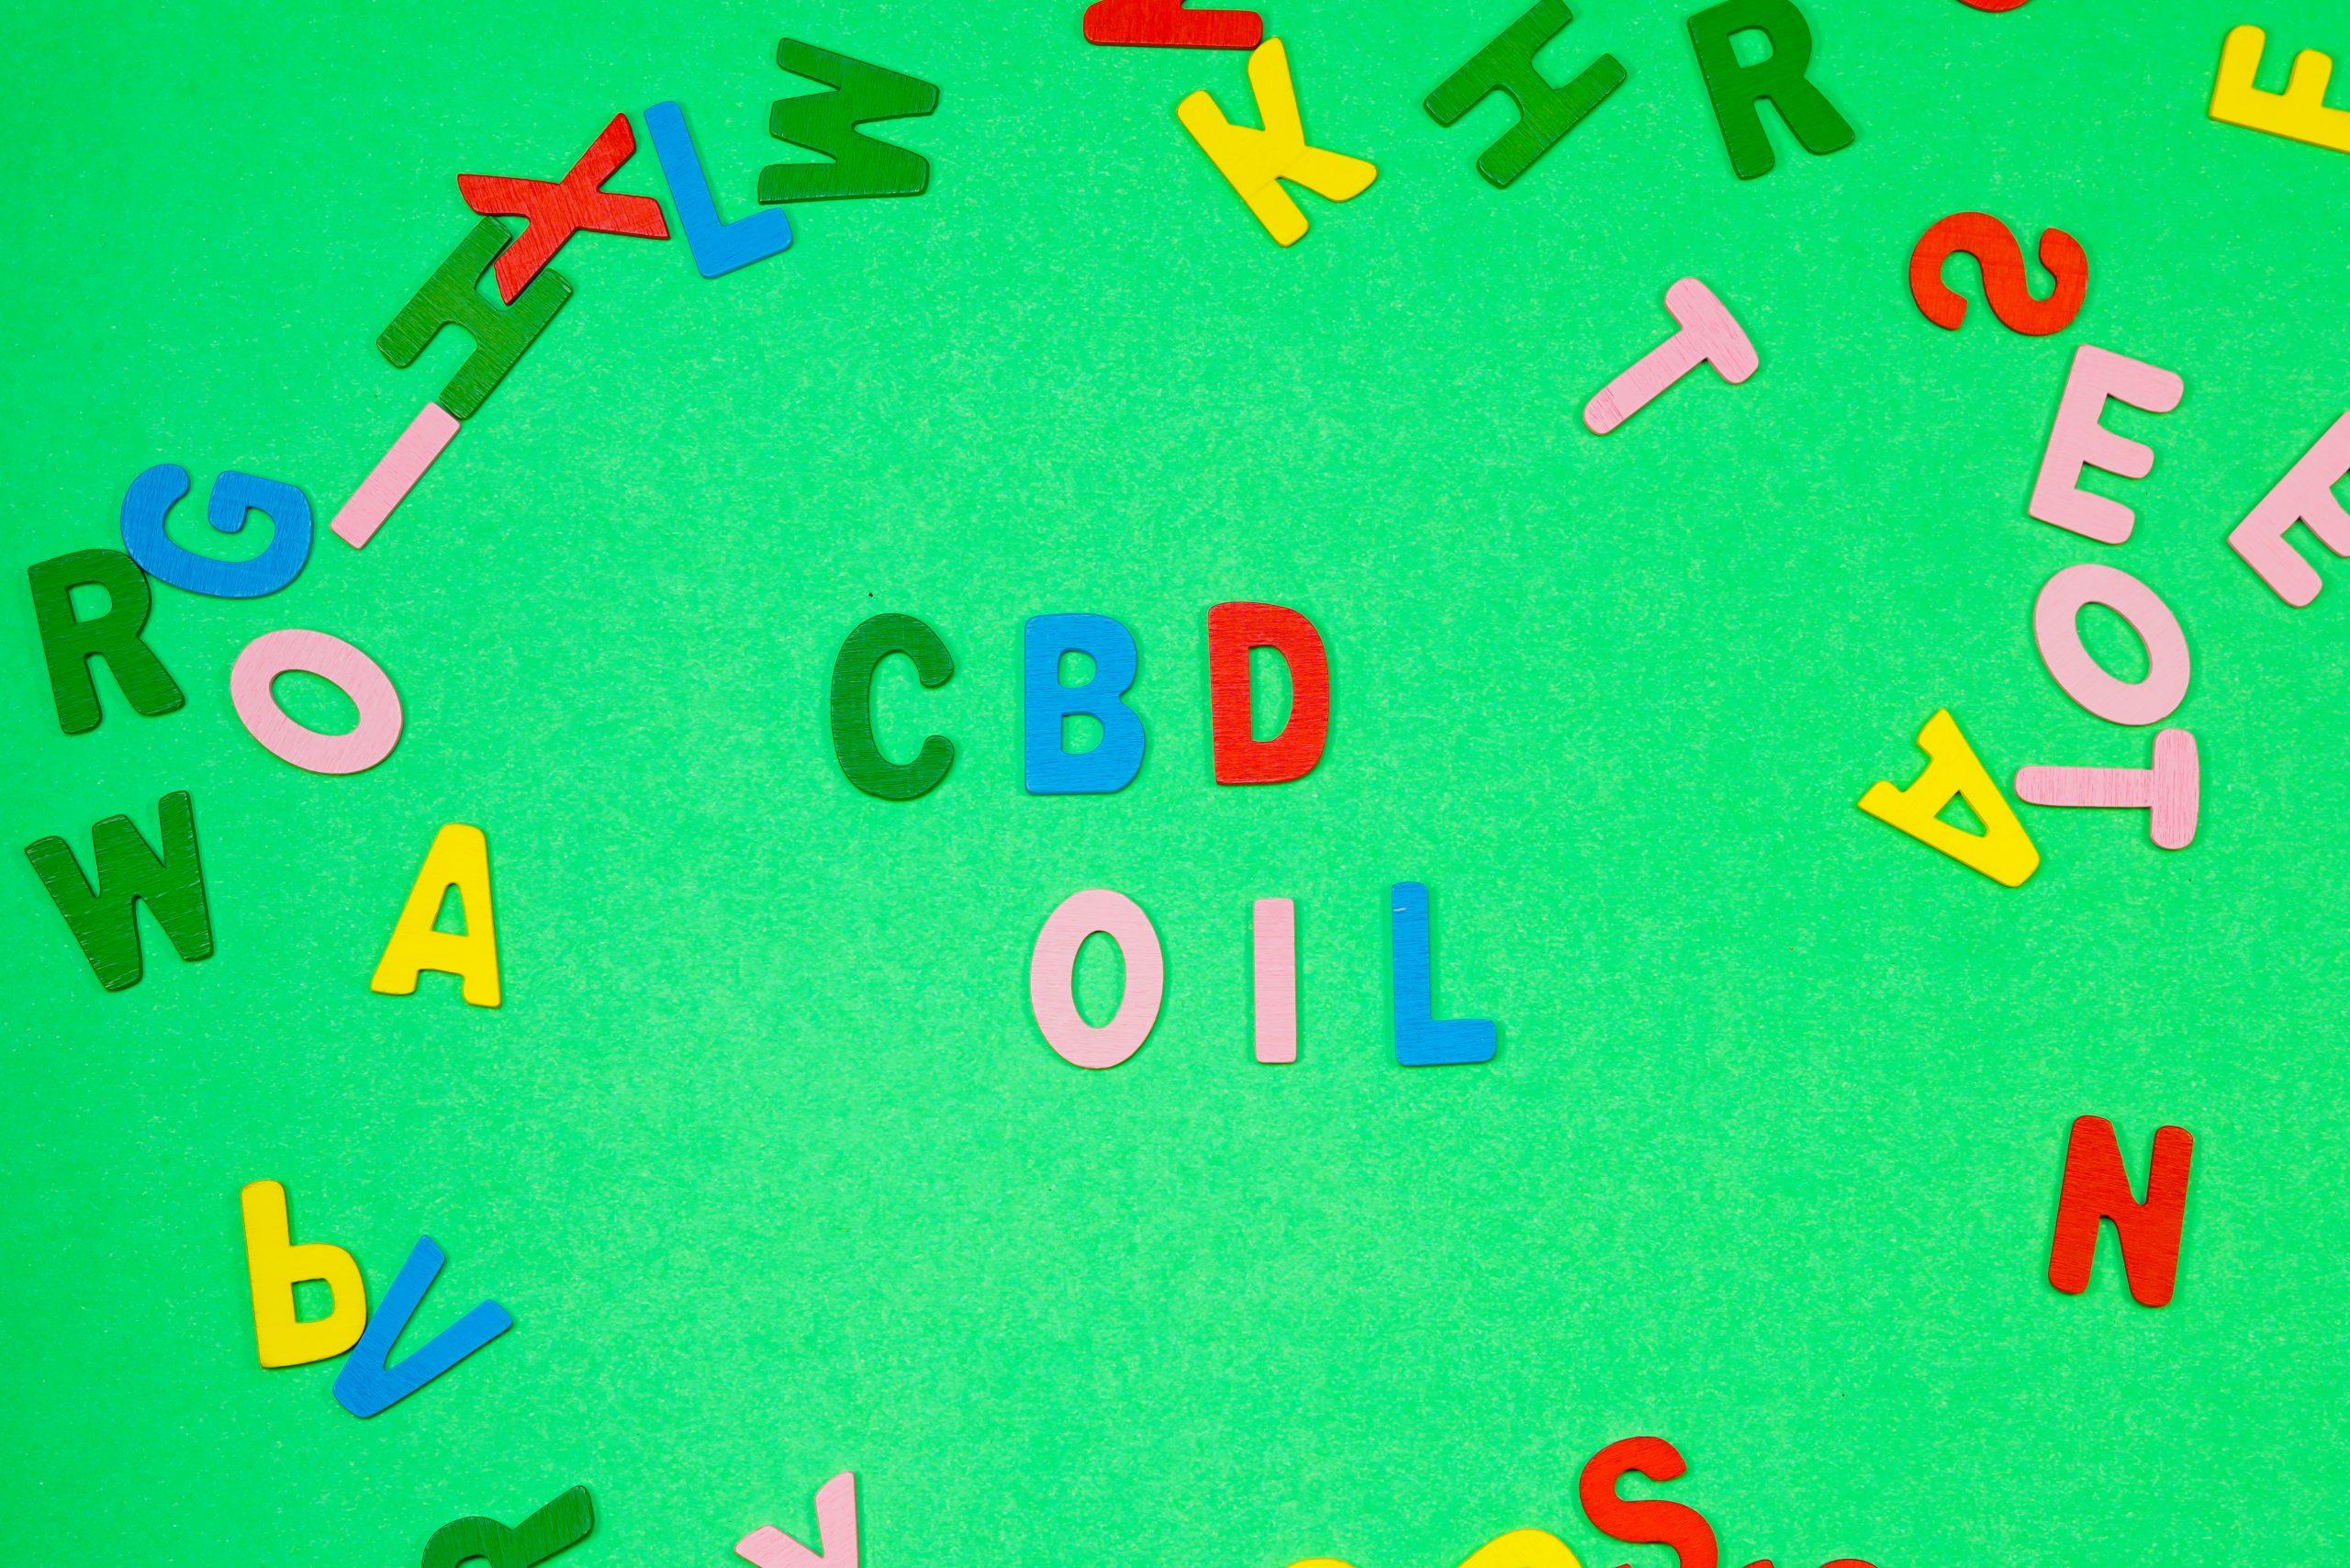 CBD oil Written with Scrabble